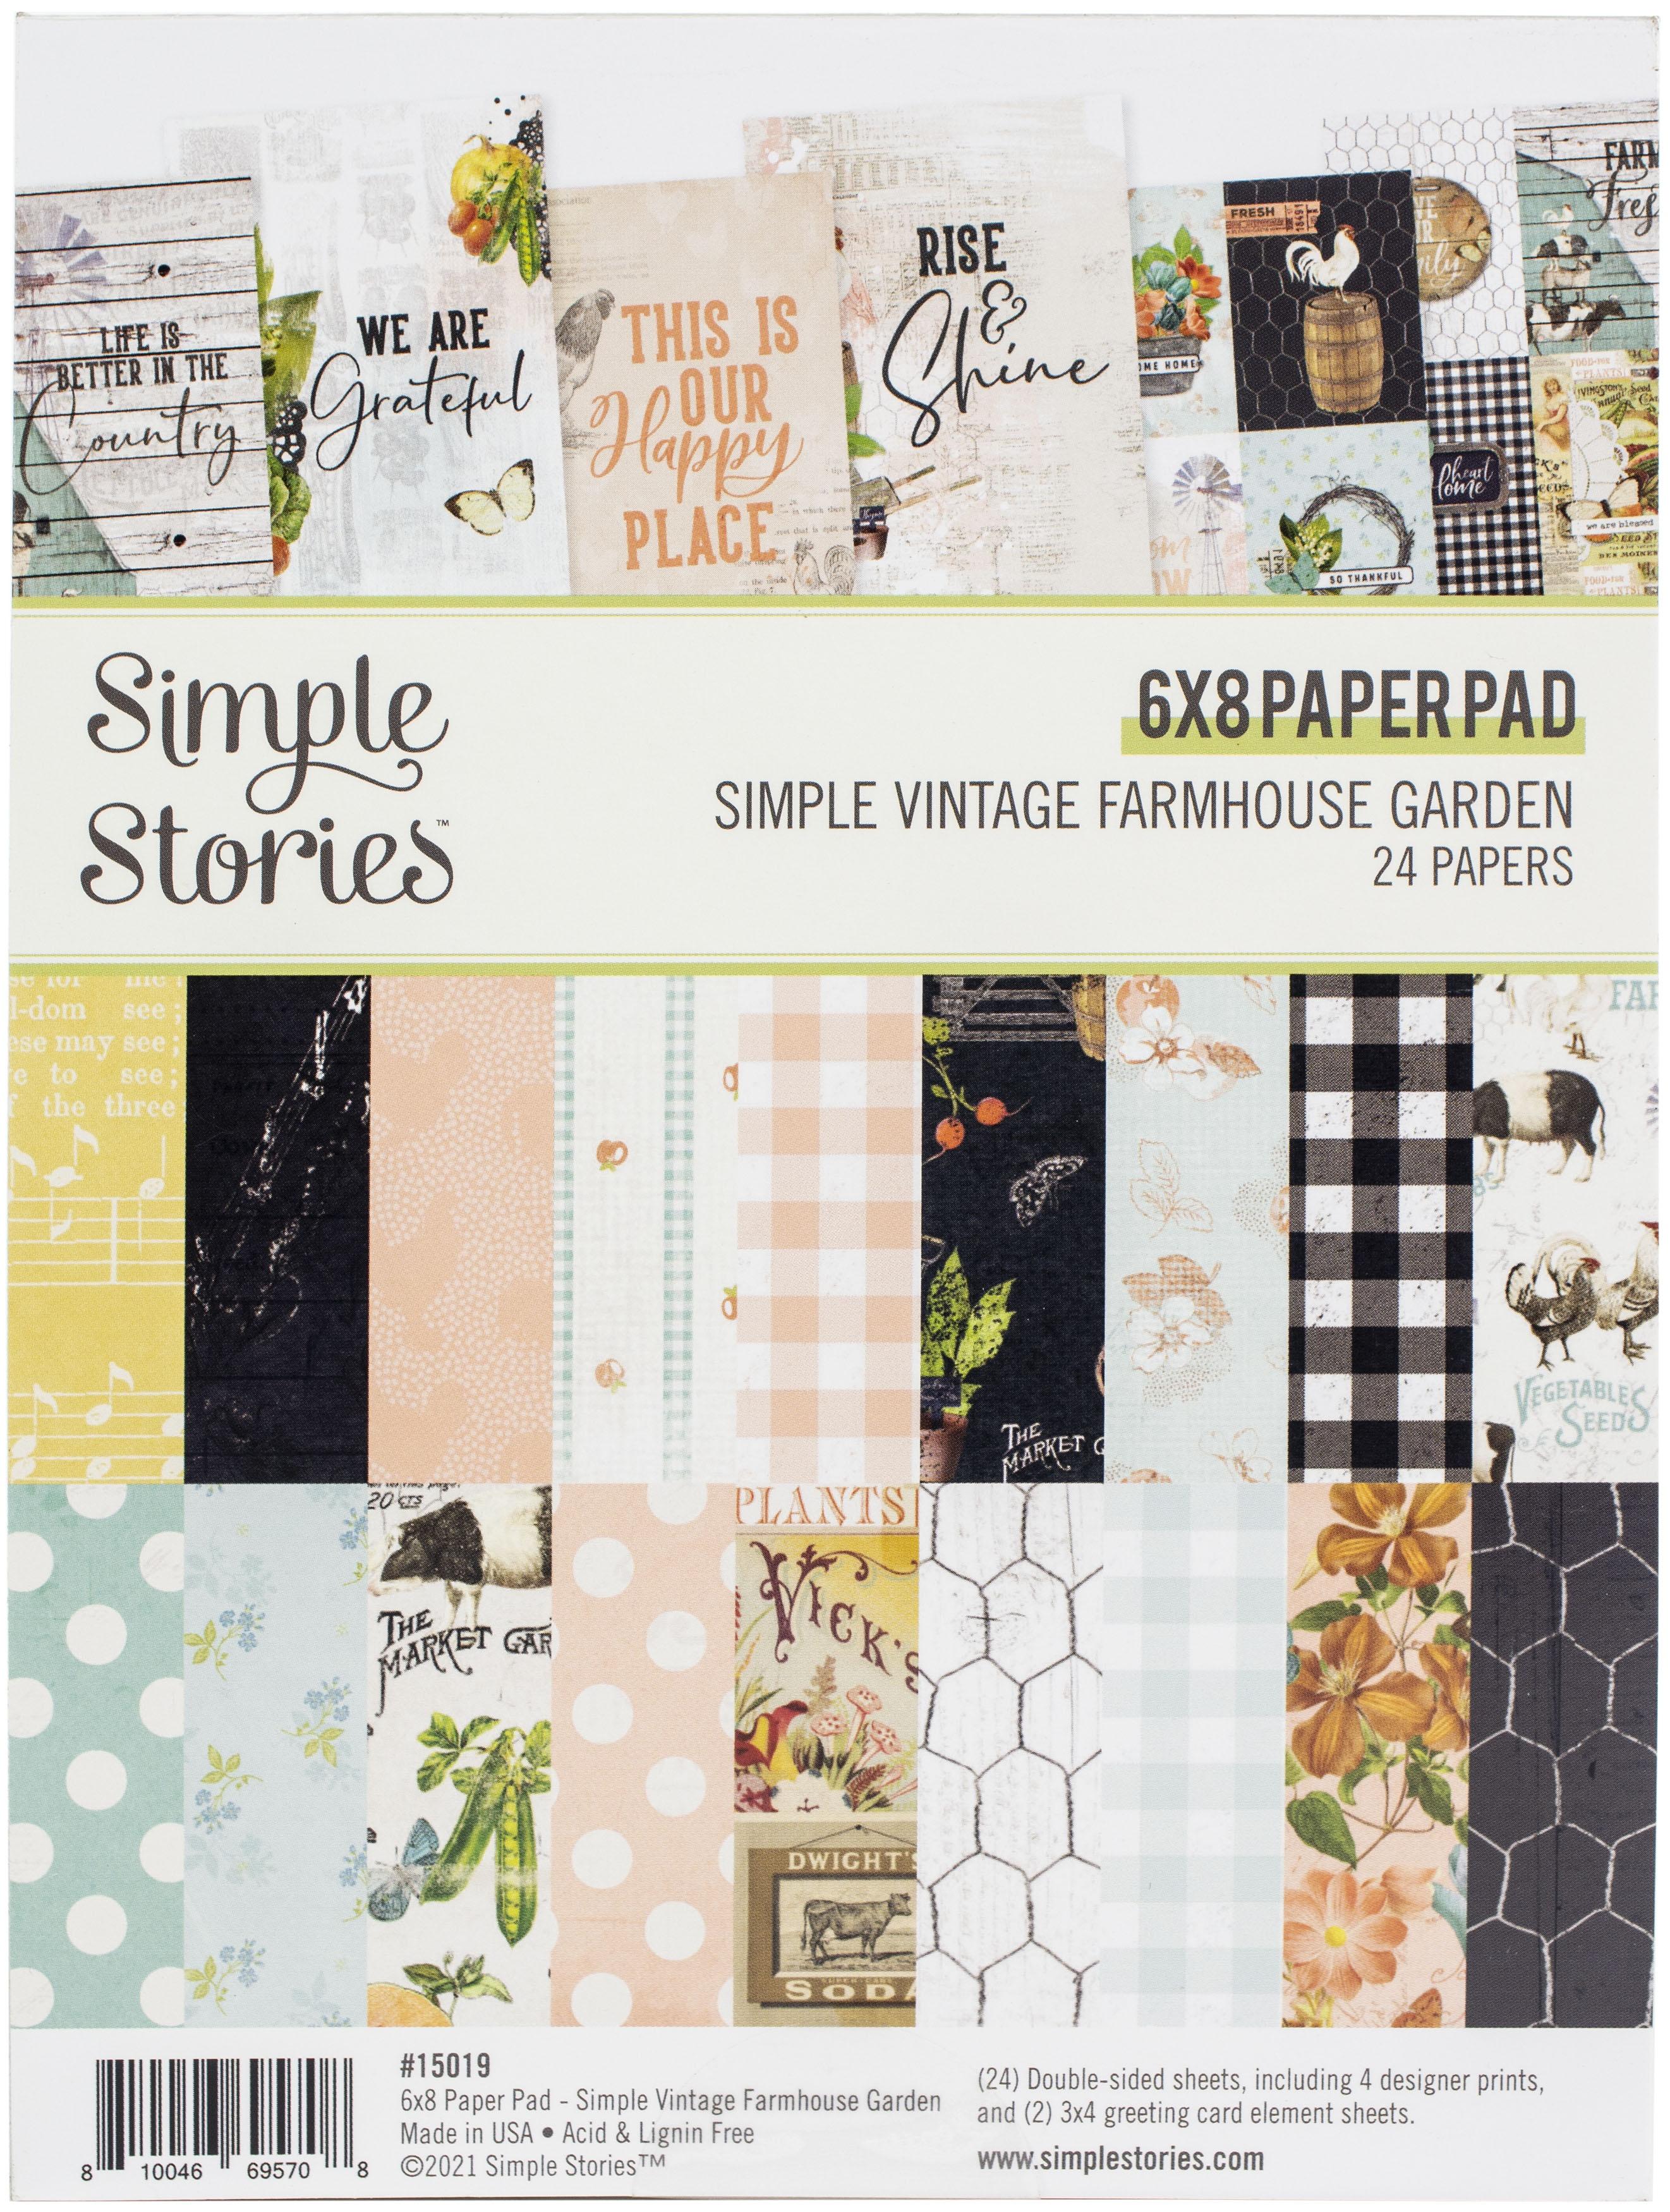 Simple Stories Double-Sided Paper Pad 6X8 24/Pkg-Simple Vintage Farmhouse Gard...